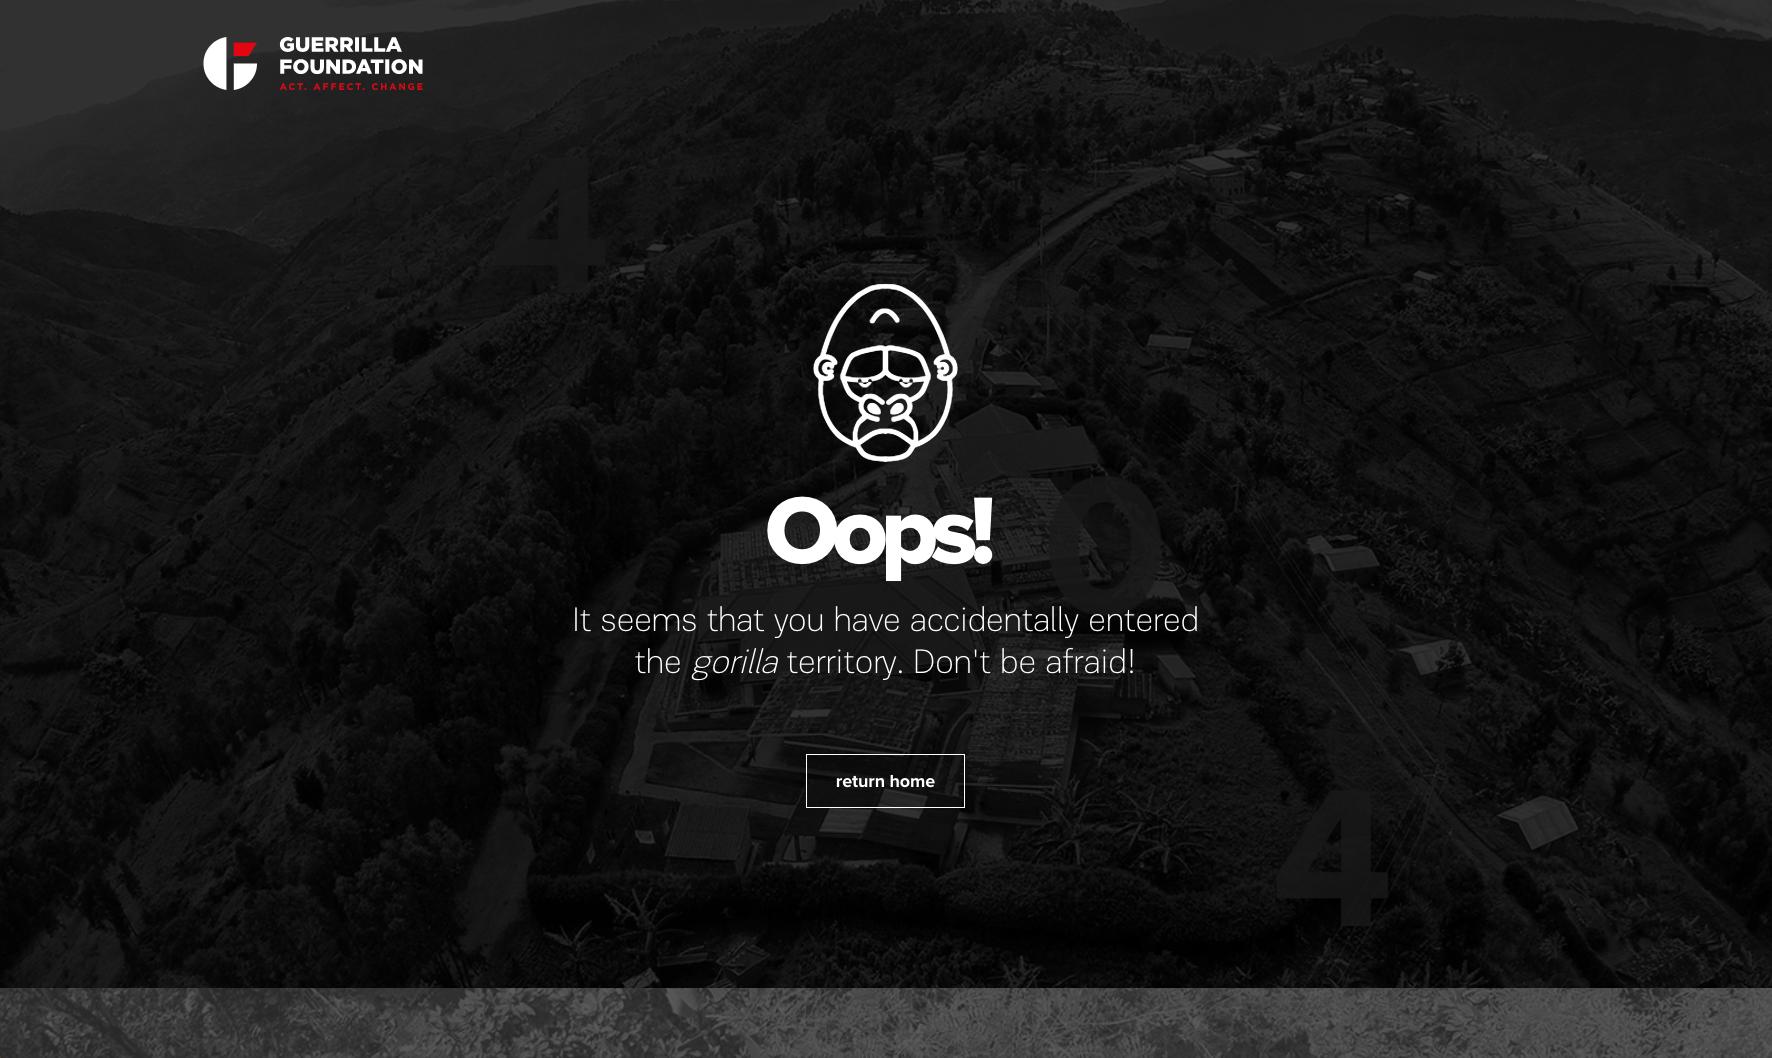 Guerilla Foundation 404 Page